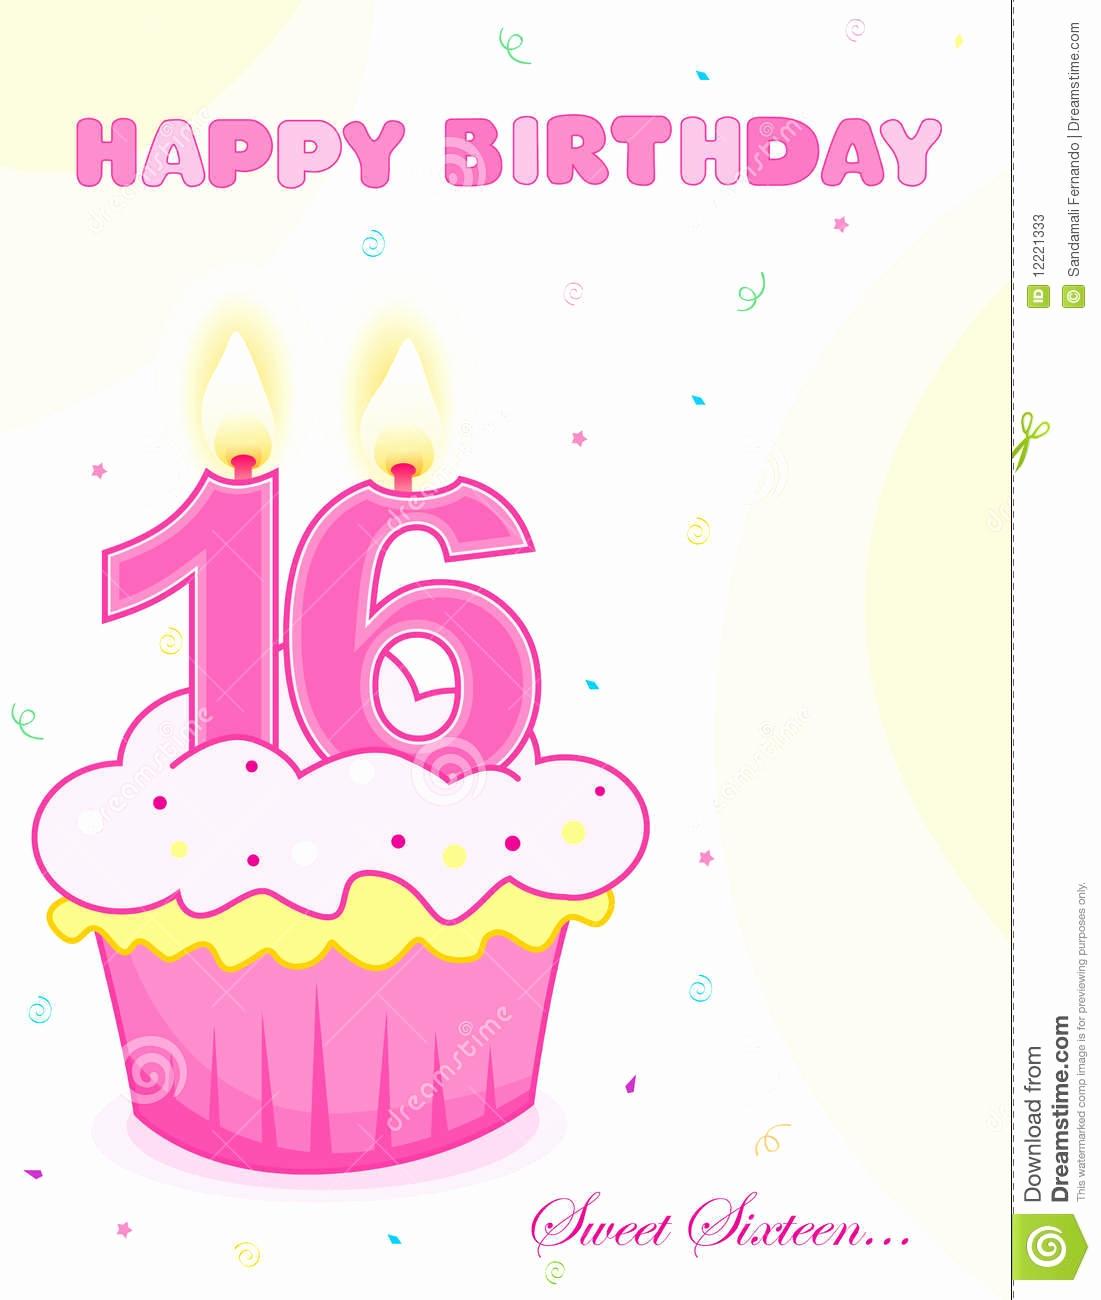 1101x1300 Sweet Sixteen Birthday Card Ideas Best Of Sweet Sixteen Birthday